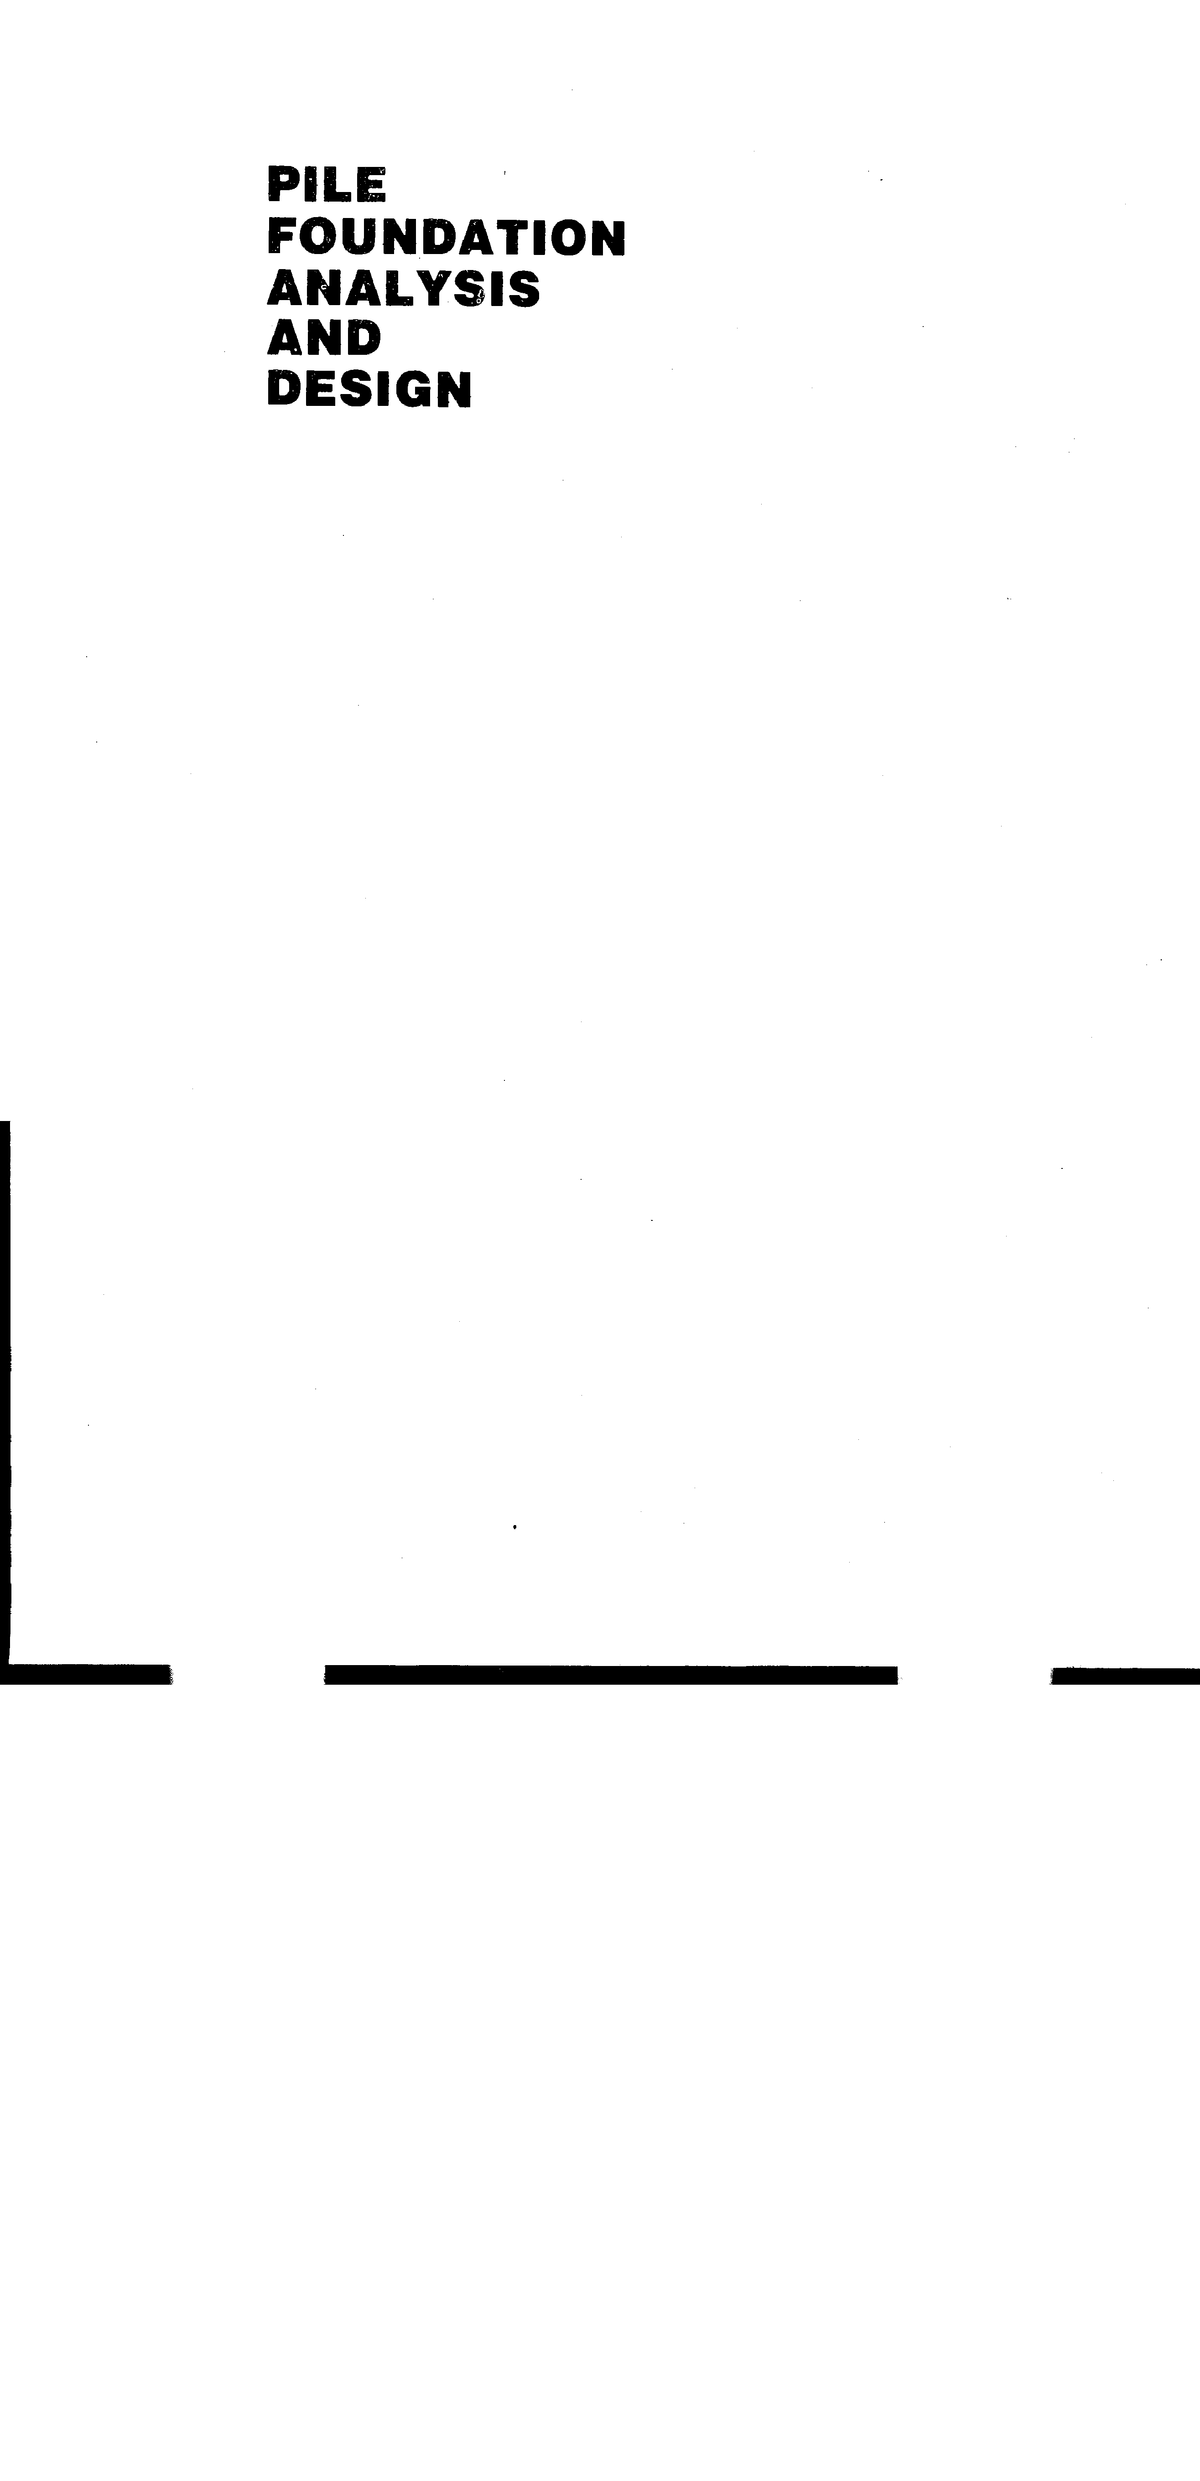 Poulos H G , Davis E H  - Pile Foundation Analysis and Design (1980